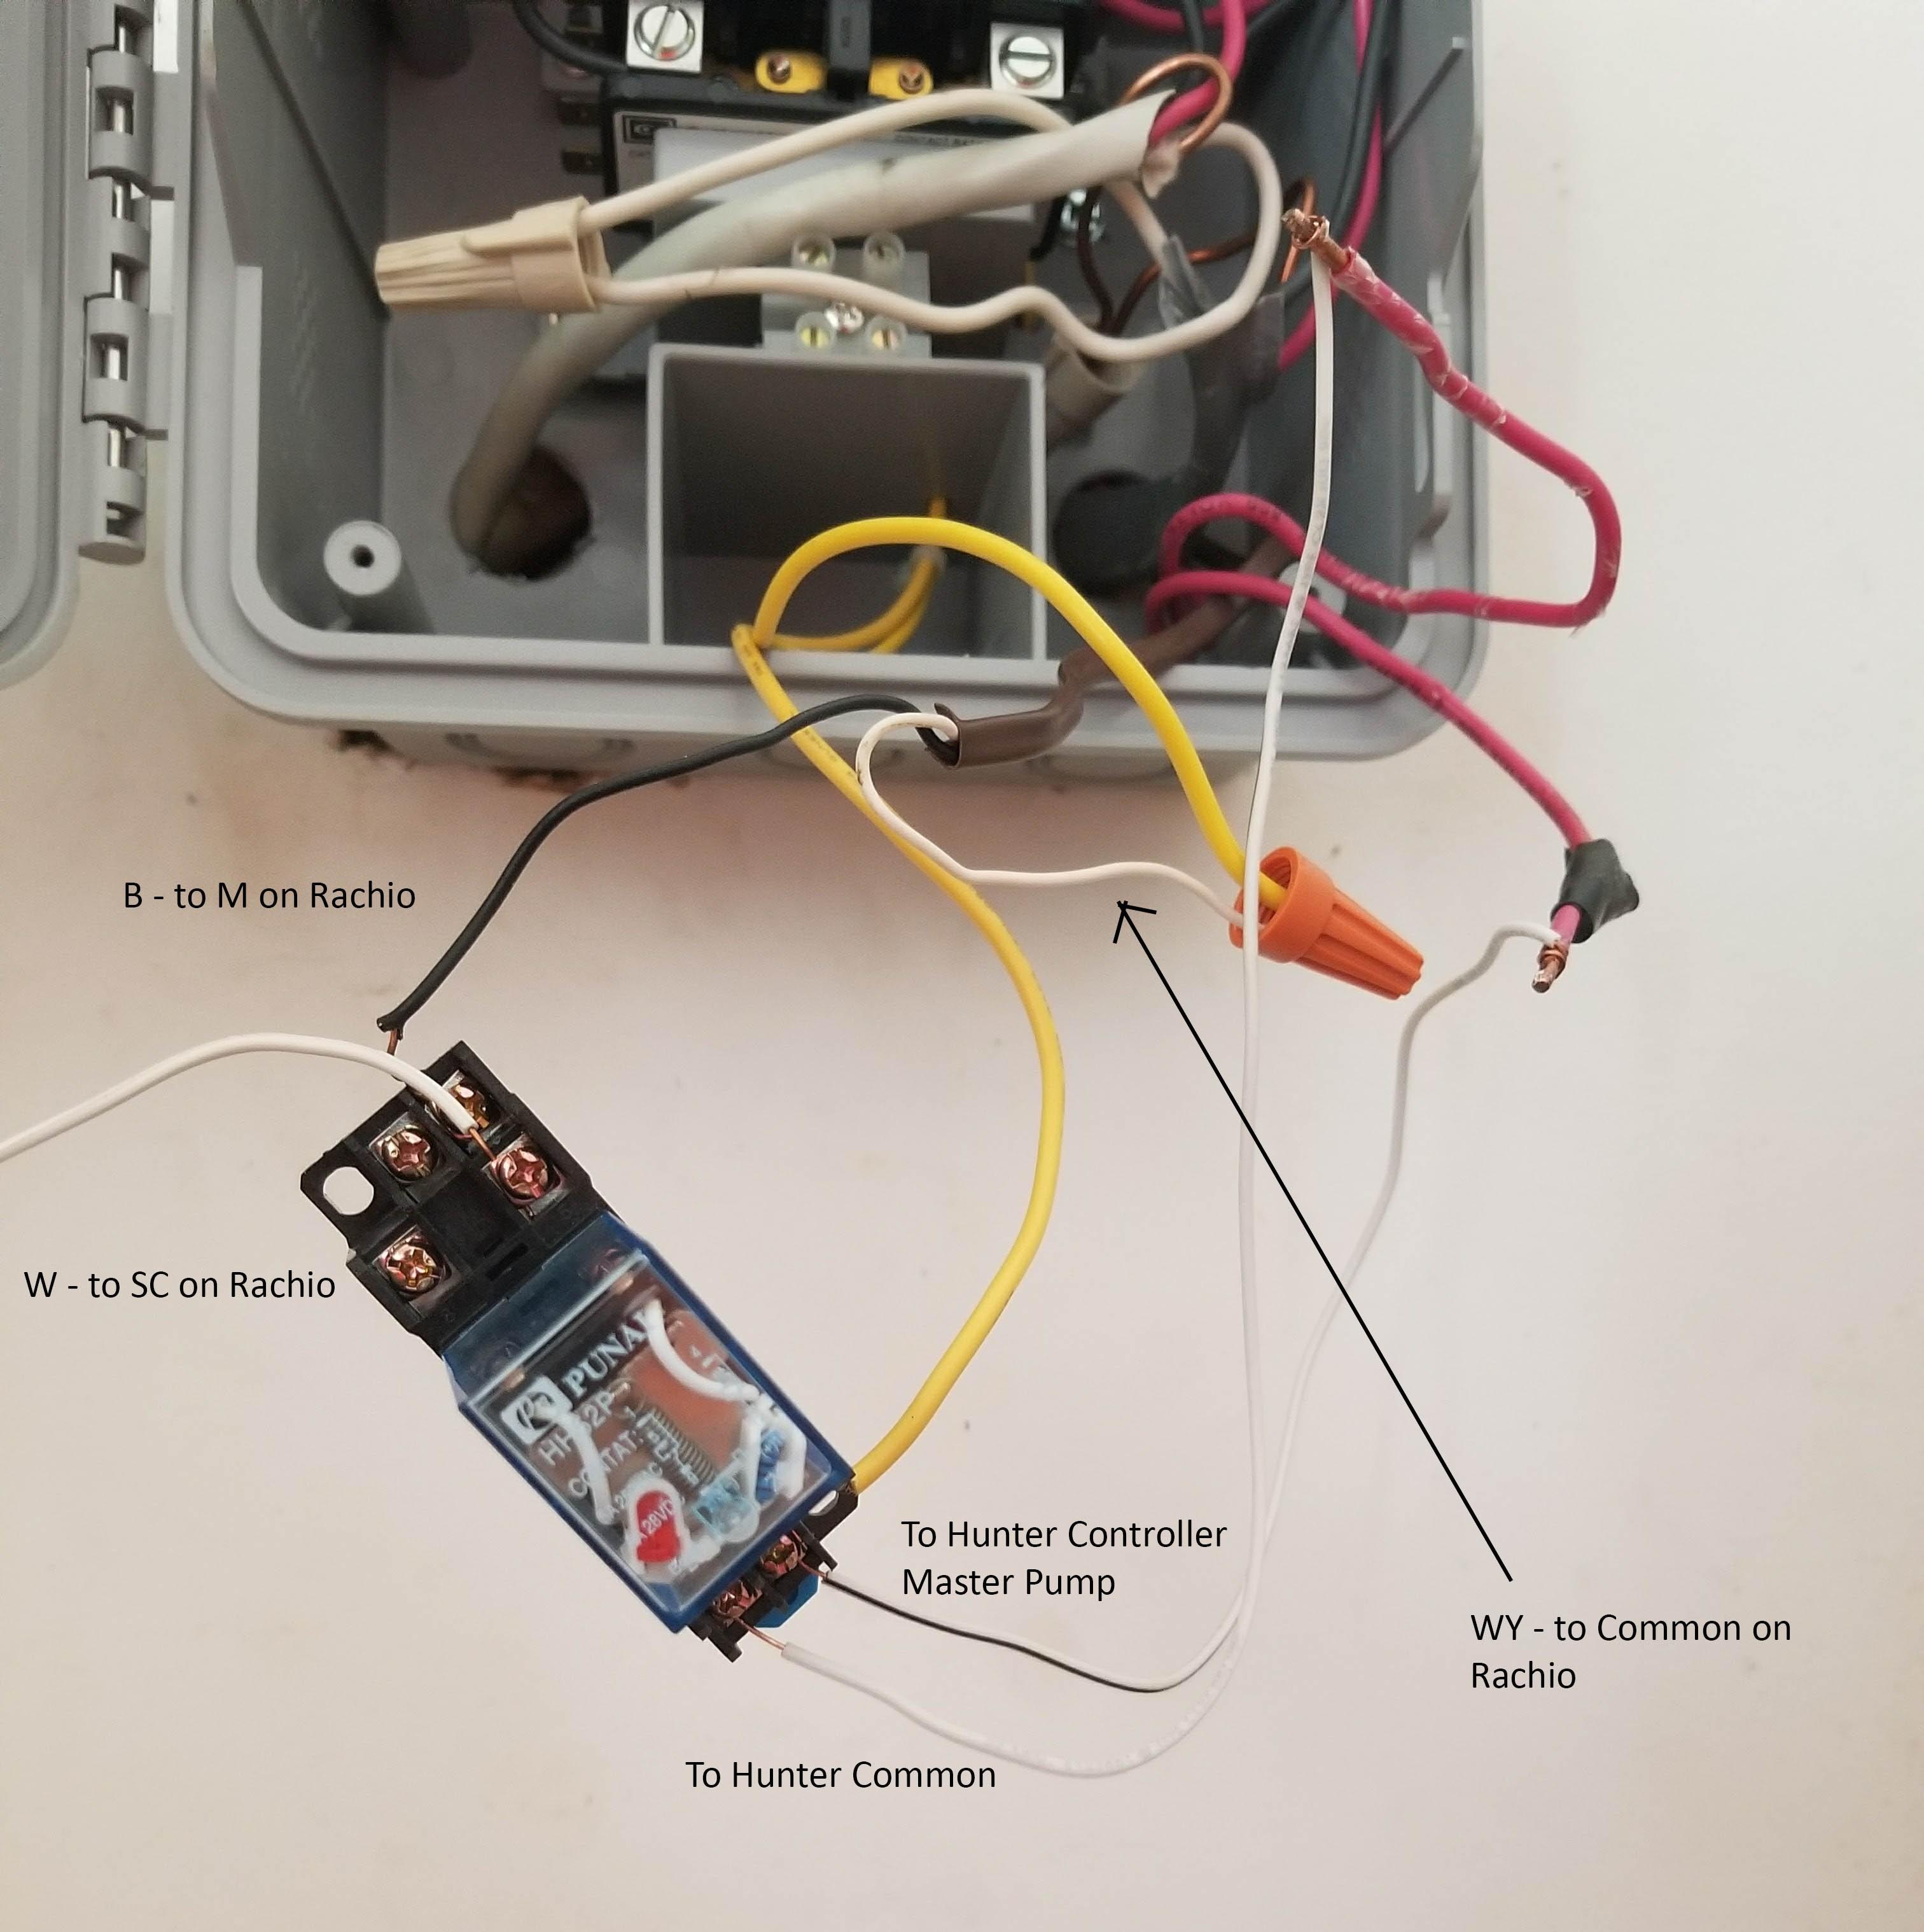 Orbit Pump Start Relay Wiring Diagram Zd 3304] Diagram Further Sprinkler System Pump Start Relay Of Orbit Pump Start Relay Wiring Diagram